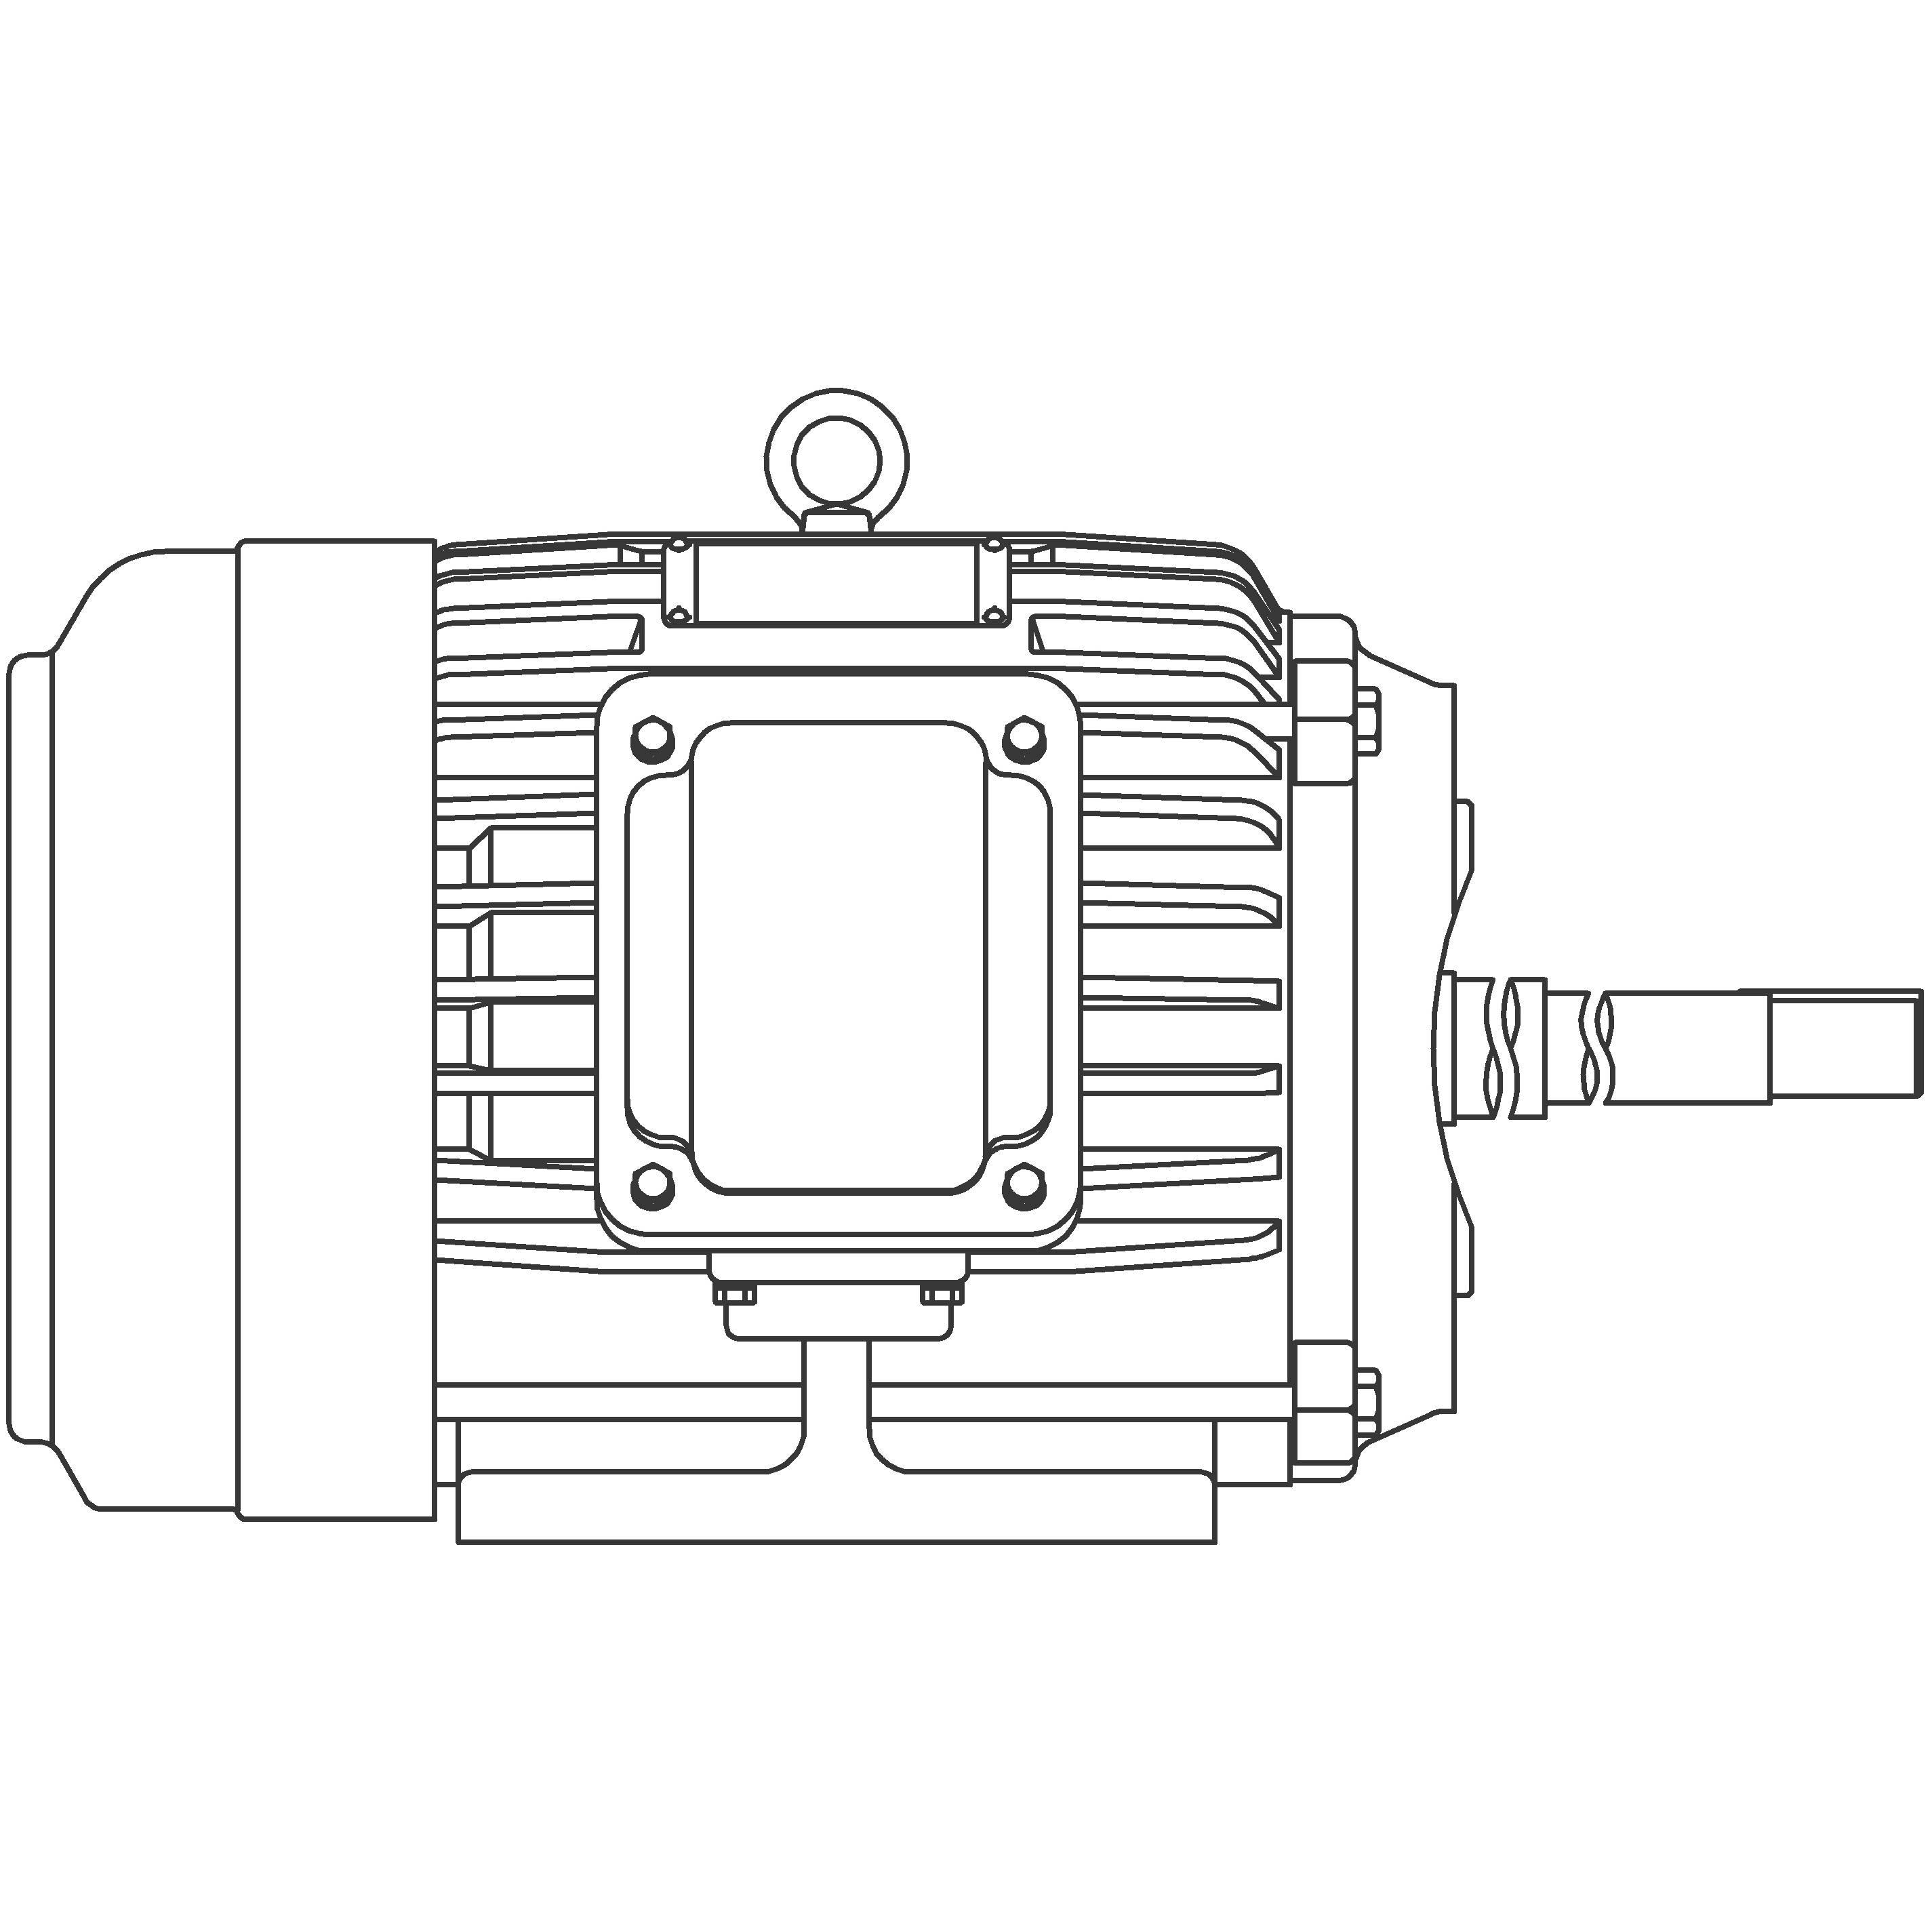 JPP0052 Teco-Westinghouse 5HP Close-Coupled Pump Electric